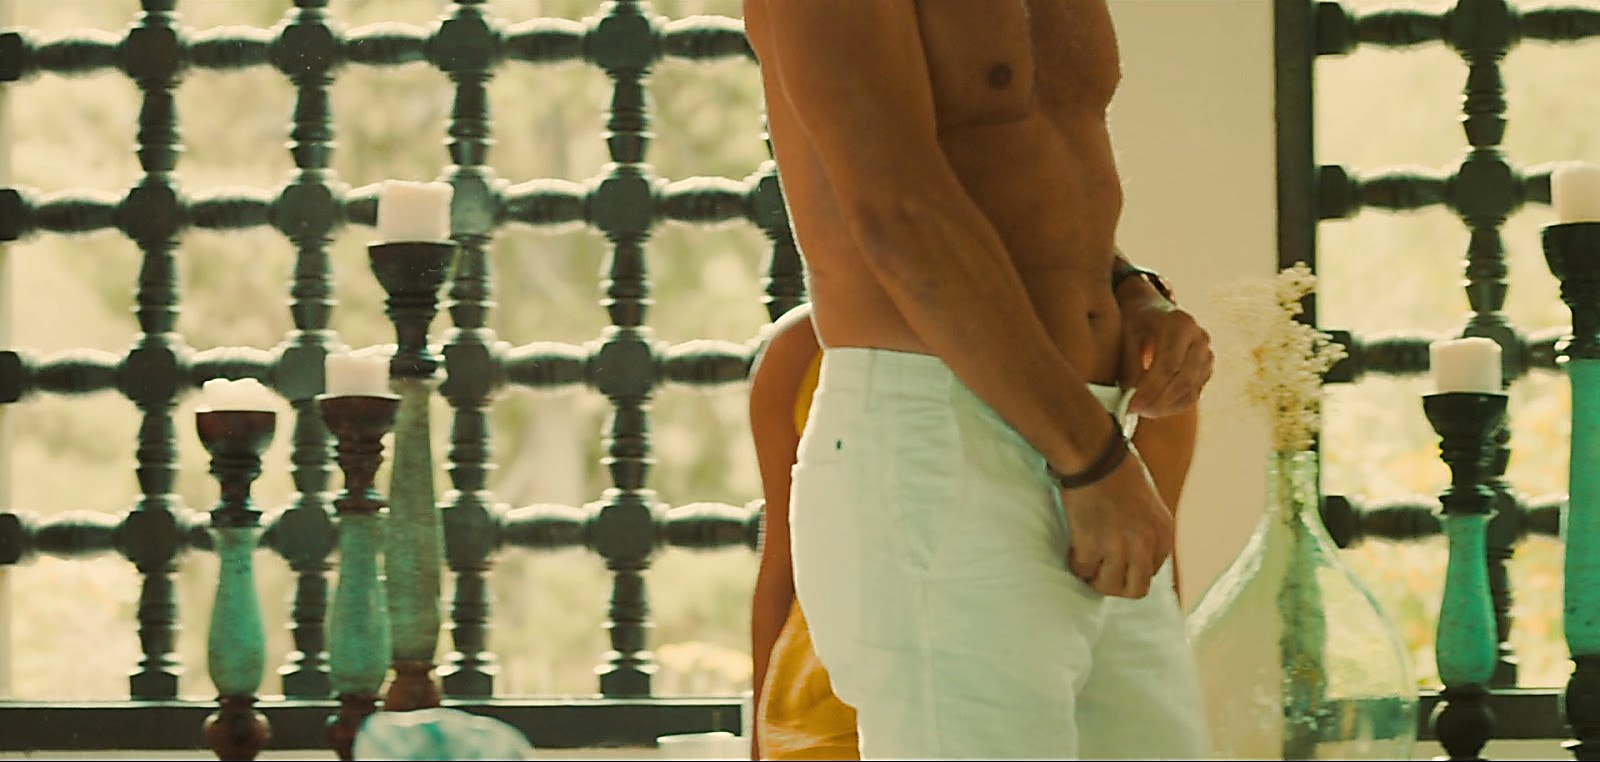 Paulo Pires sexy shirtless scene May 19, 2020, 4am